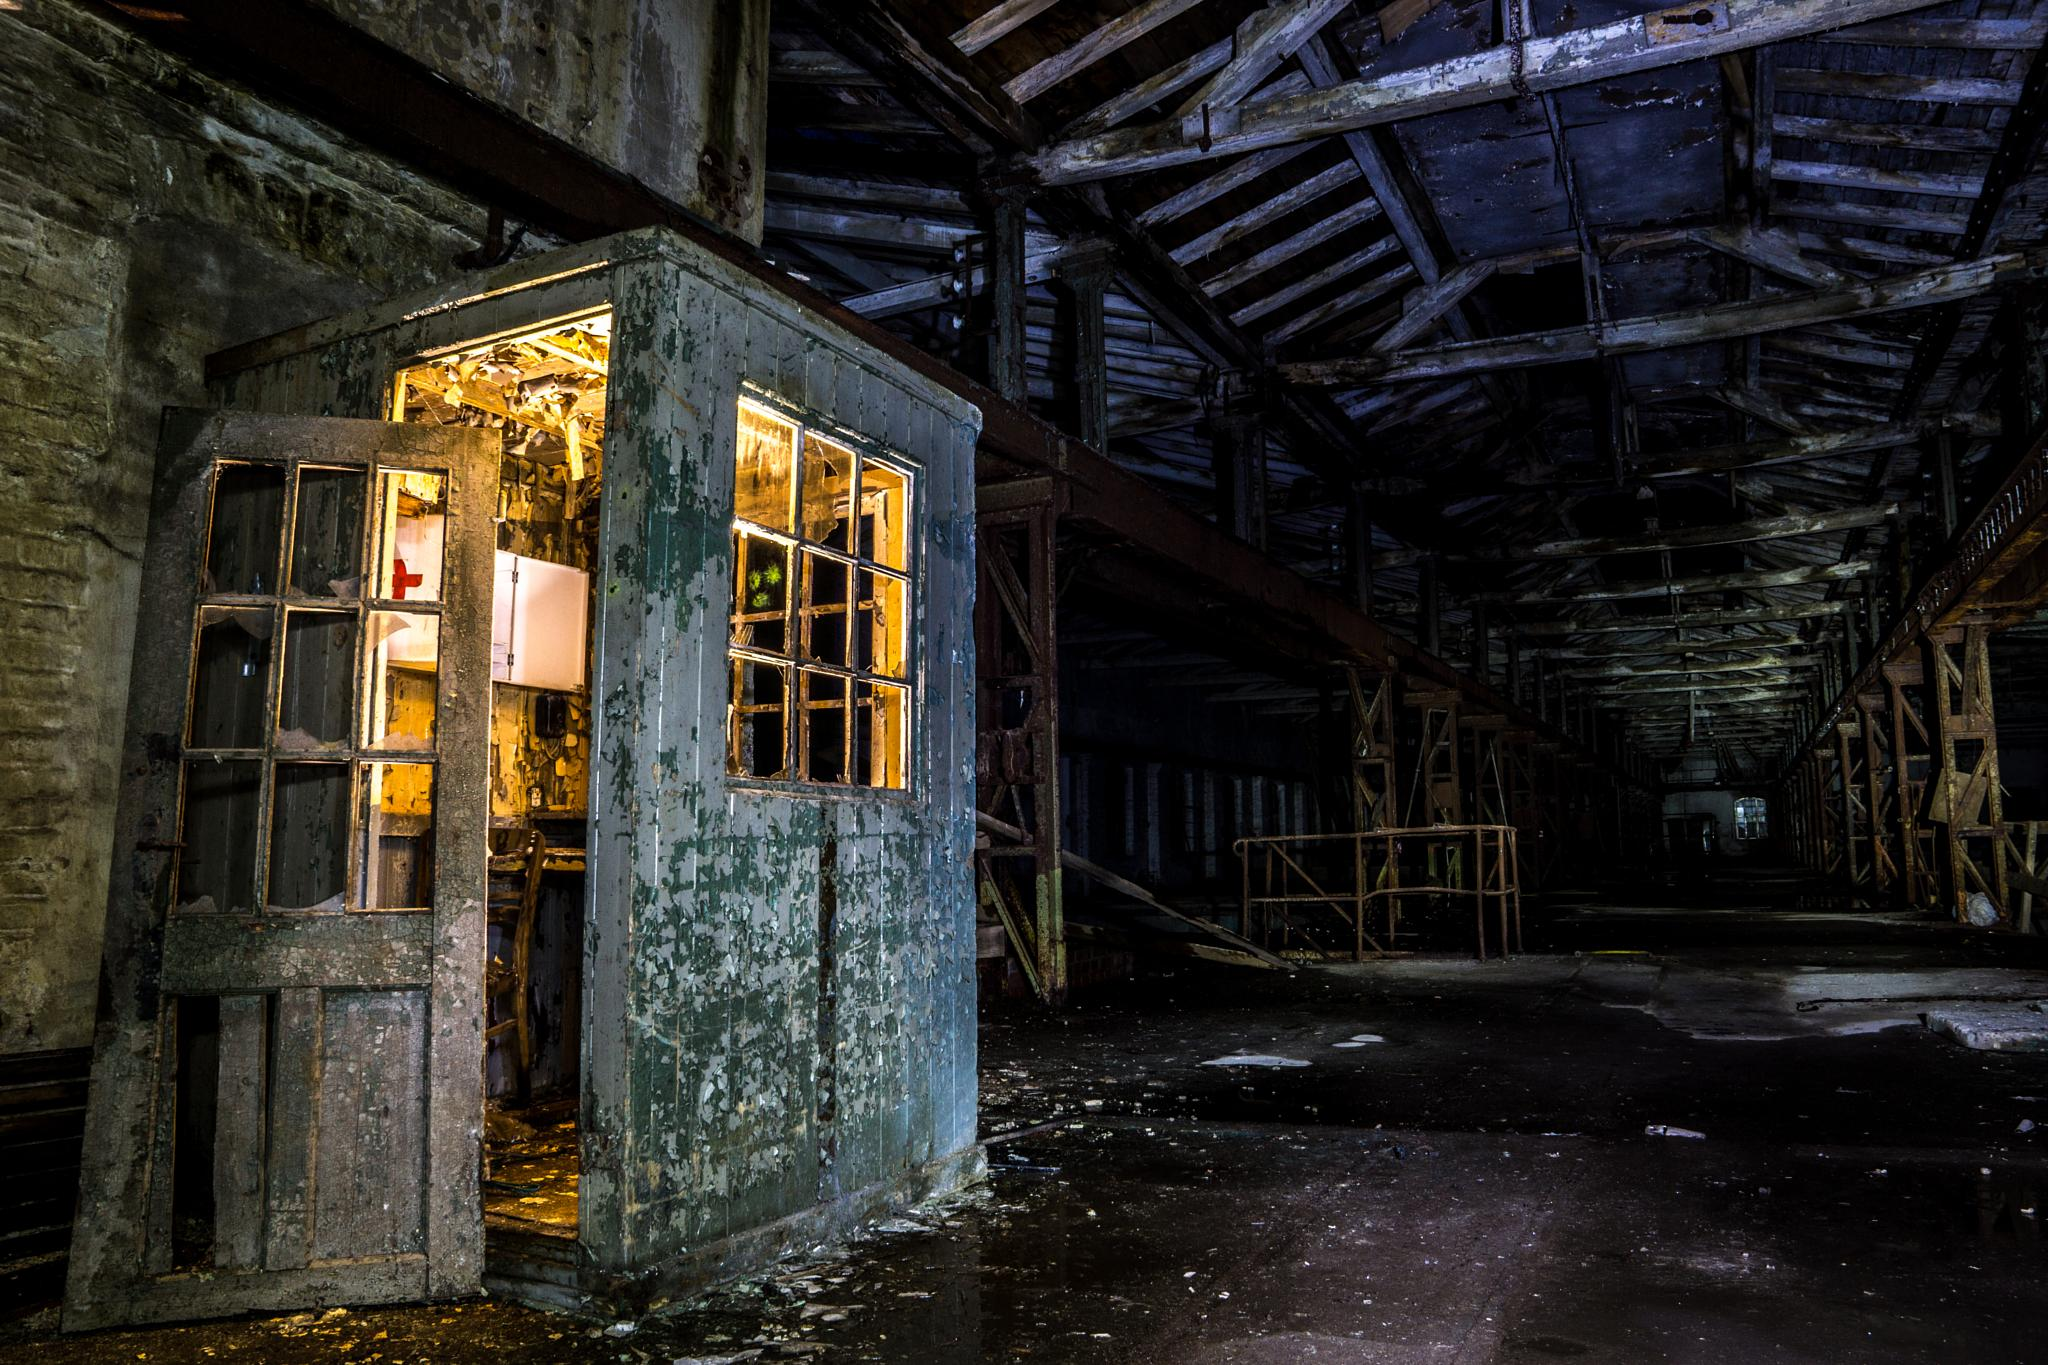 Lightroom #1 by Subground.info